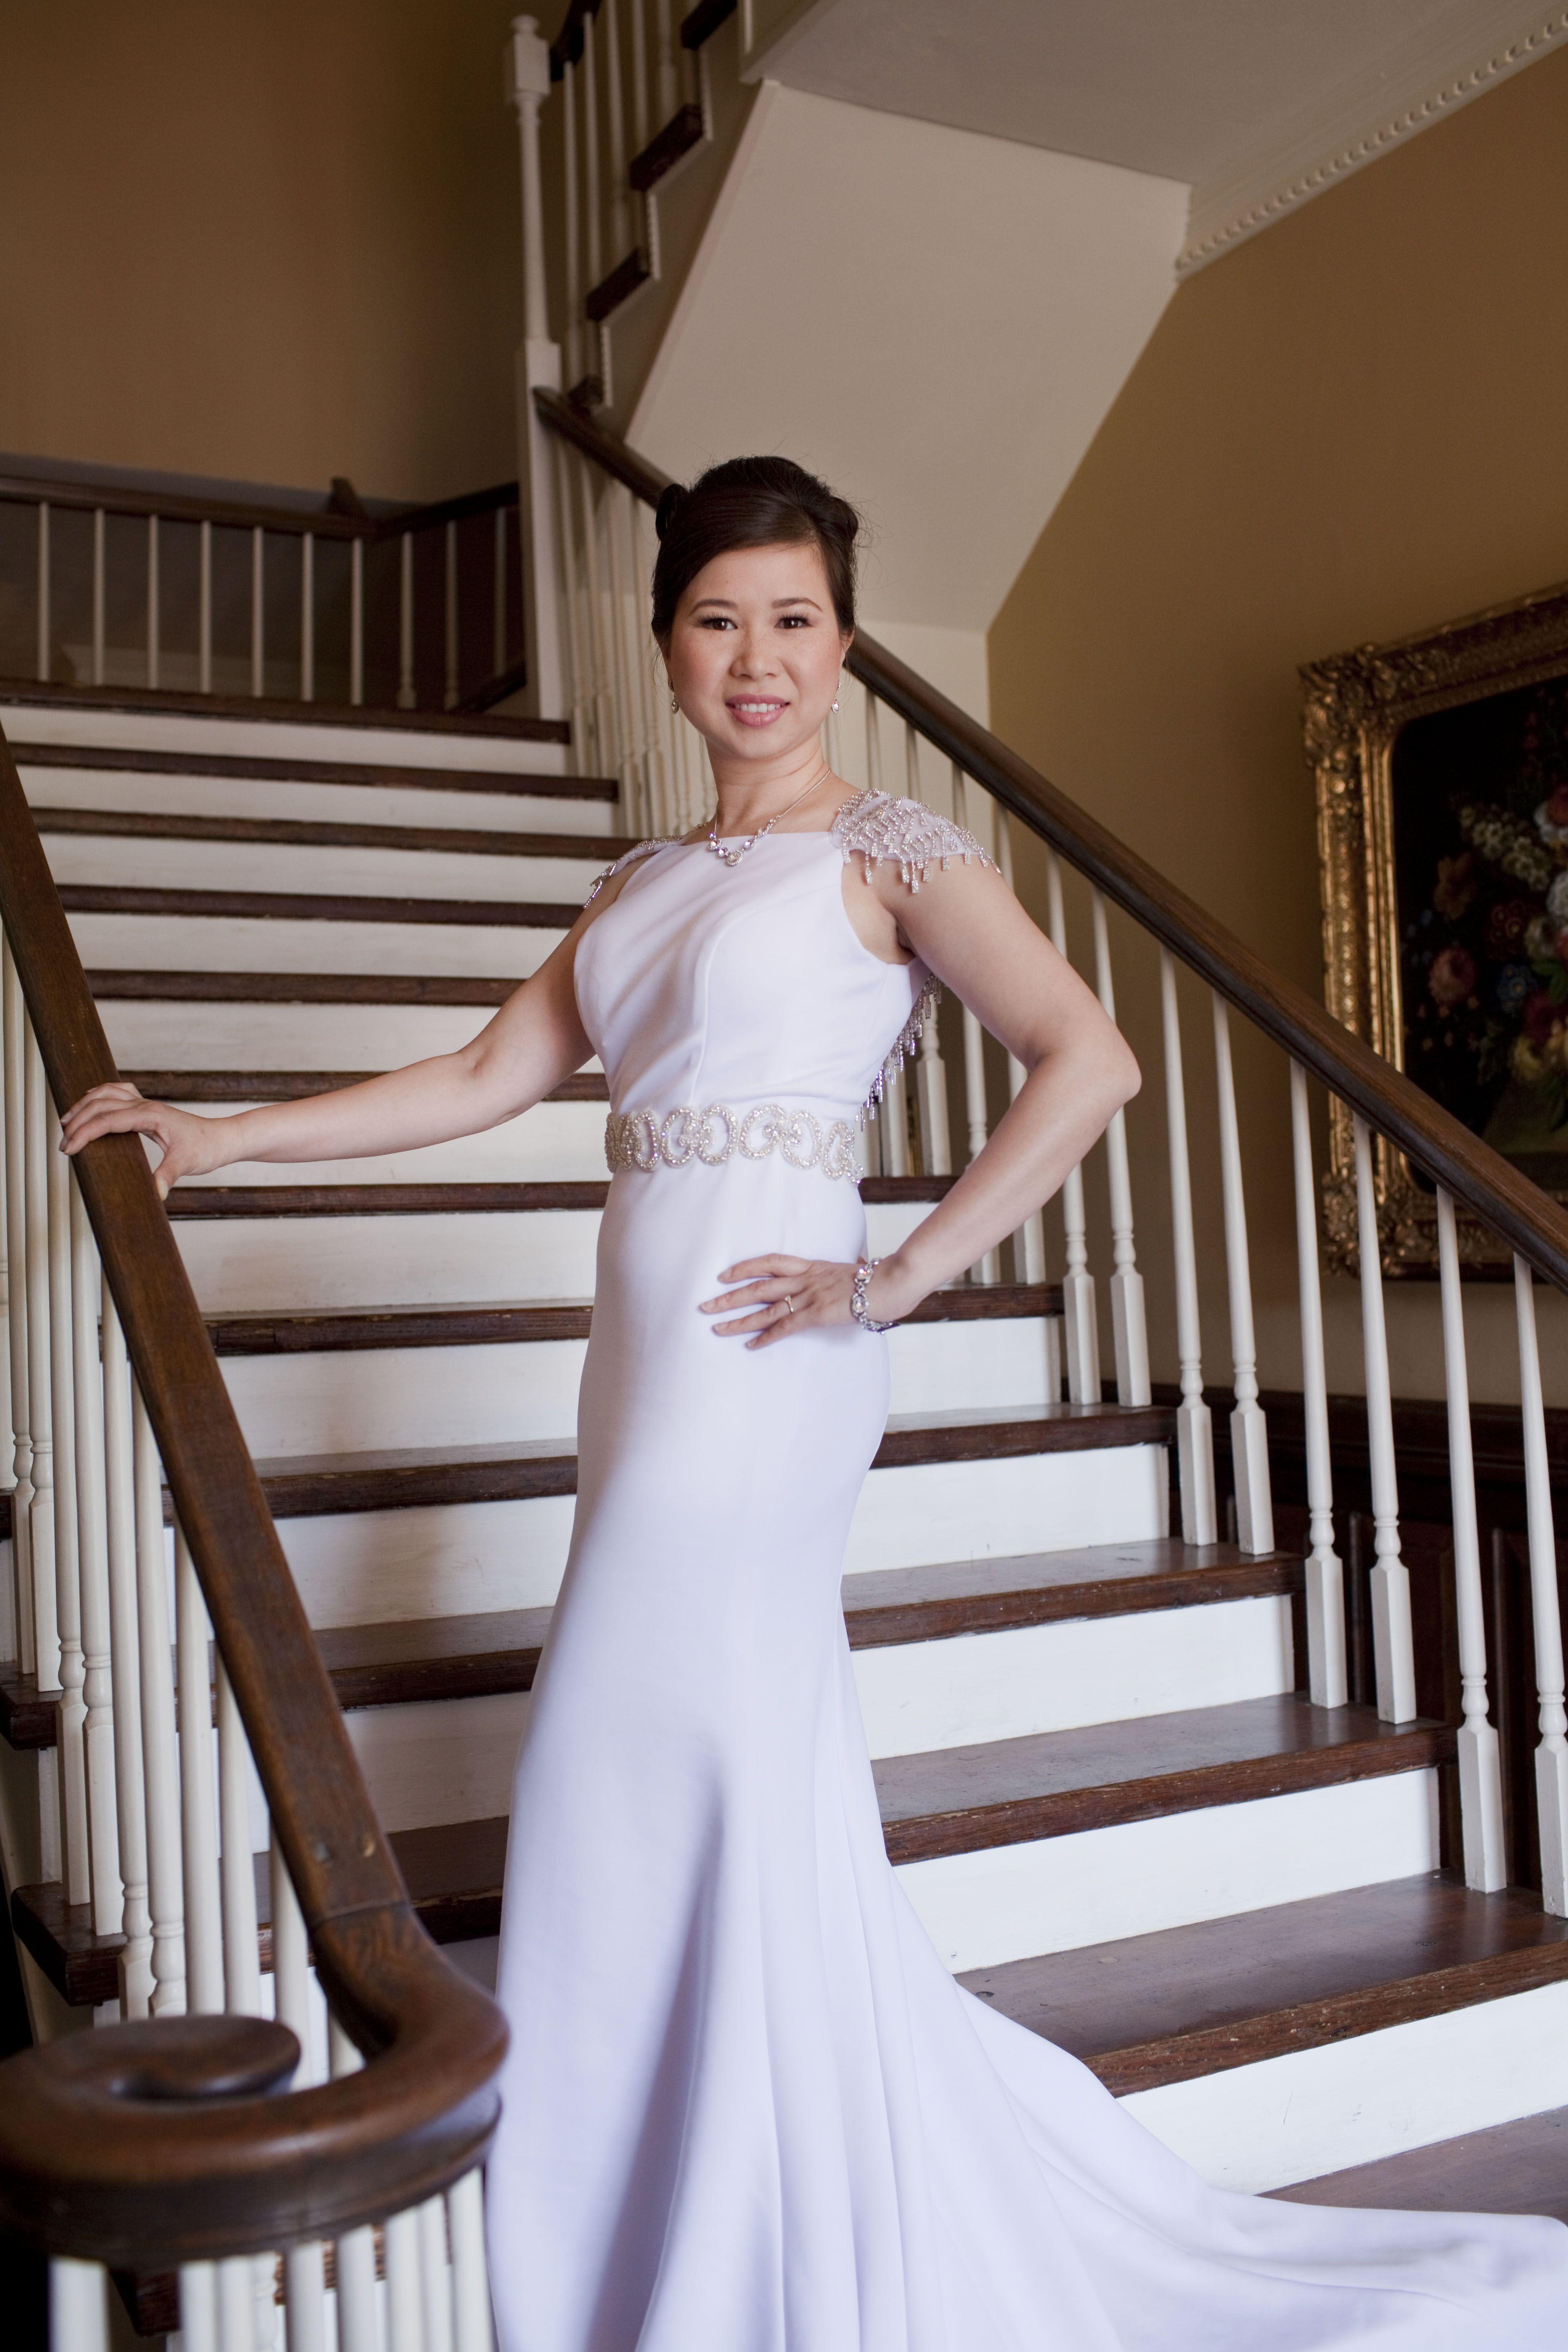 Baton Rouge Louisiana Photographer Bridal Photography Mermaid Formal Dress Formal Dresses Bridal Photography [ 5616 x 3744 Pixel ]